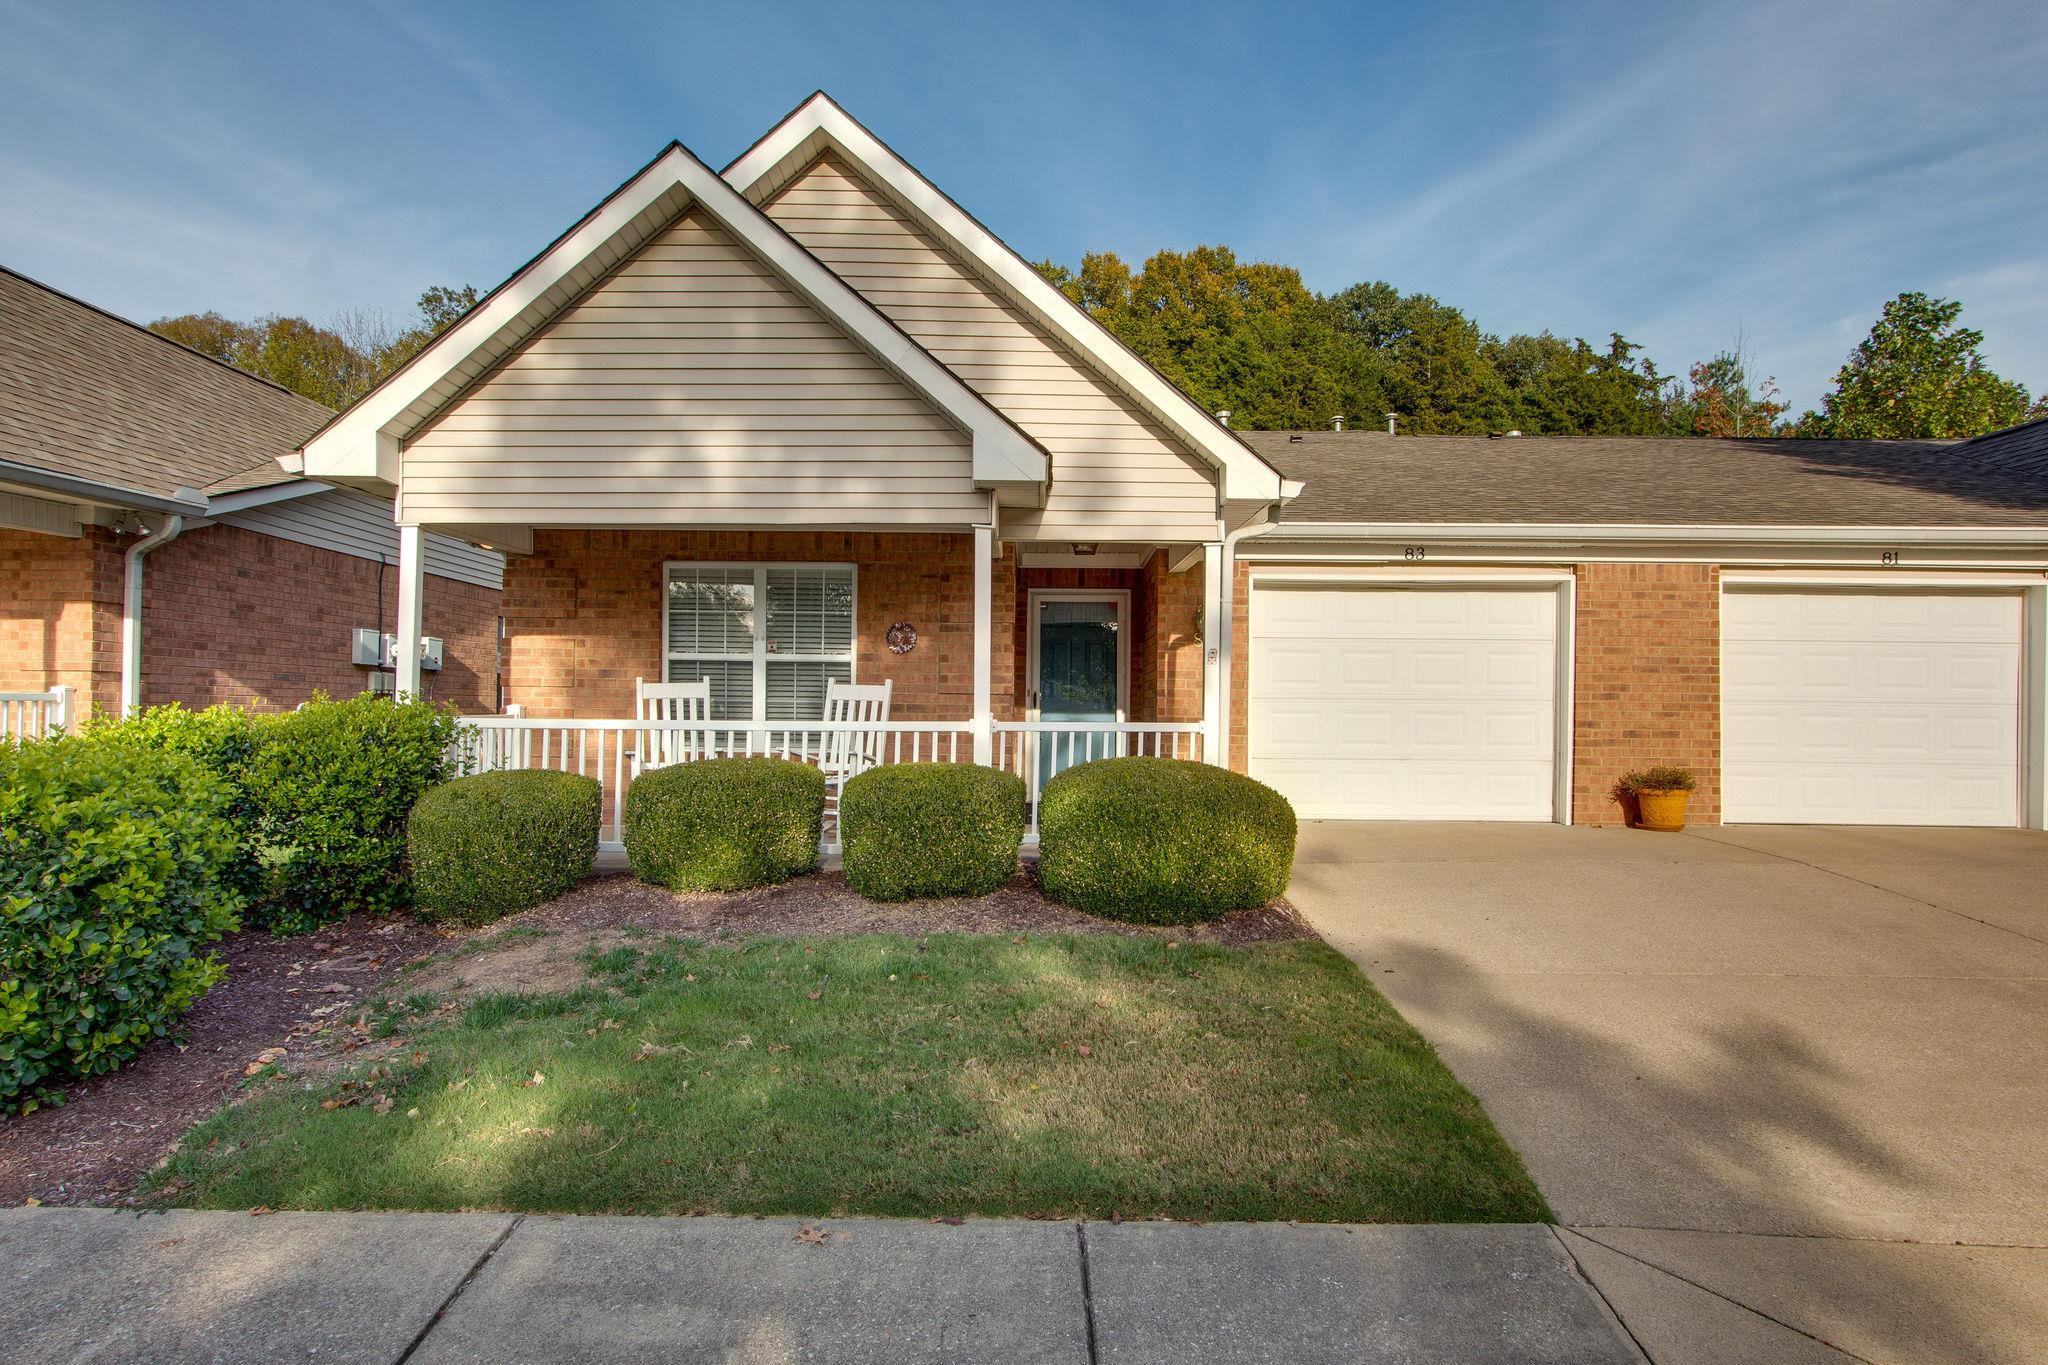 83 Alton Park Ln, Franklin, TN 37069 - Franklin, TN real estate listing